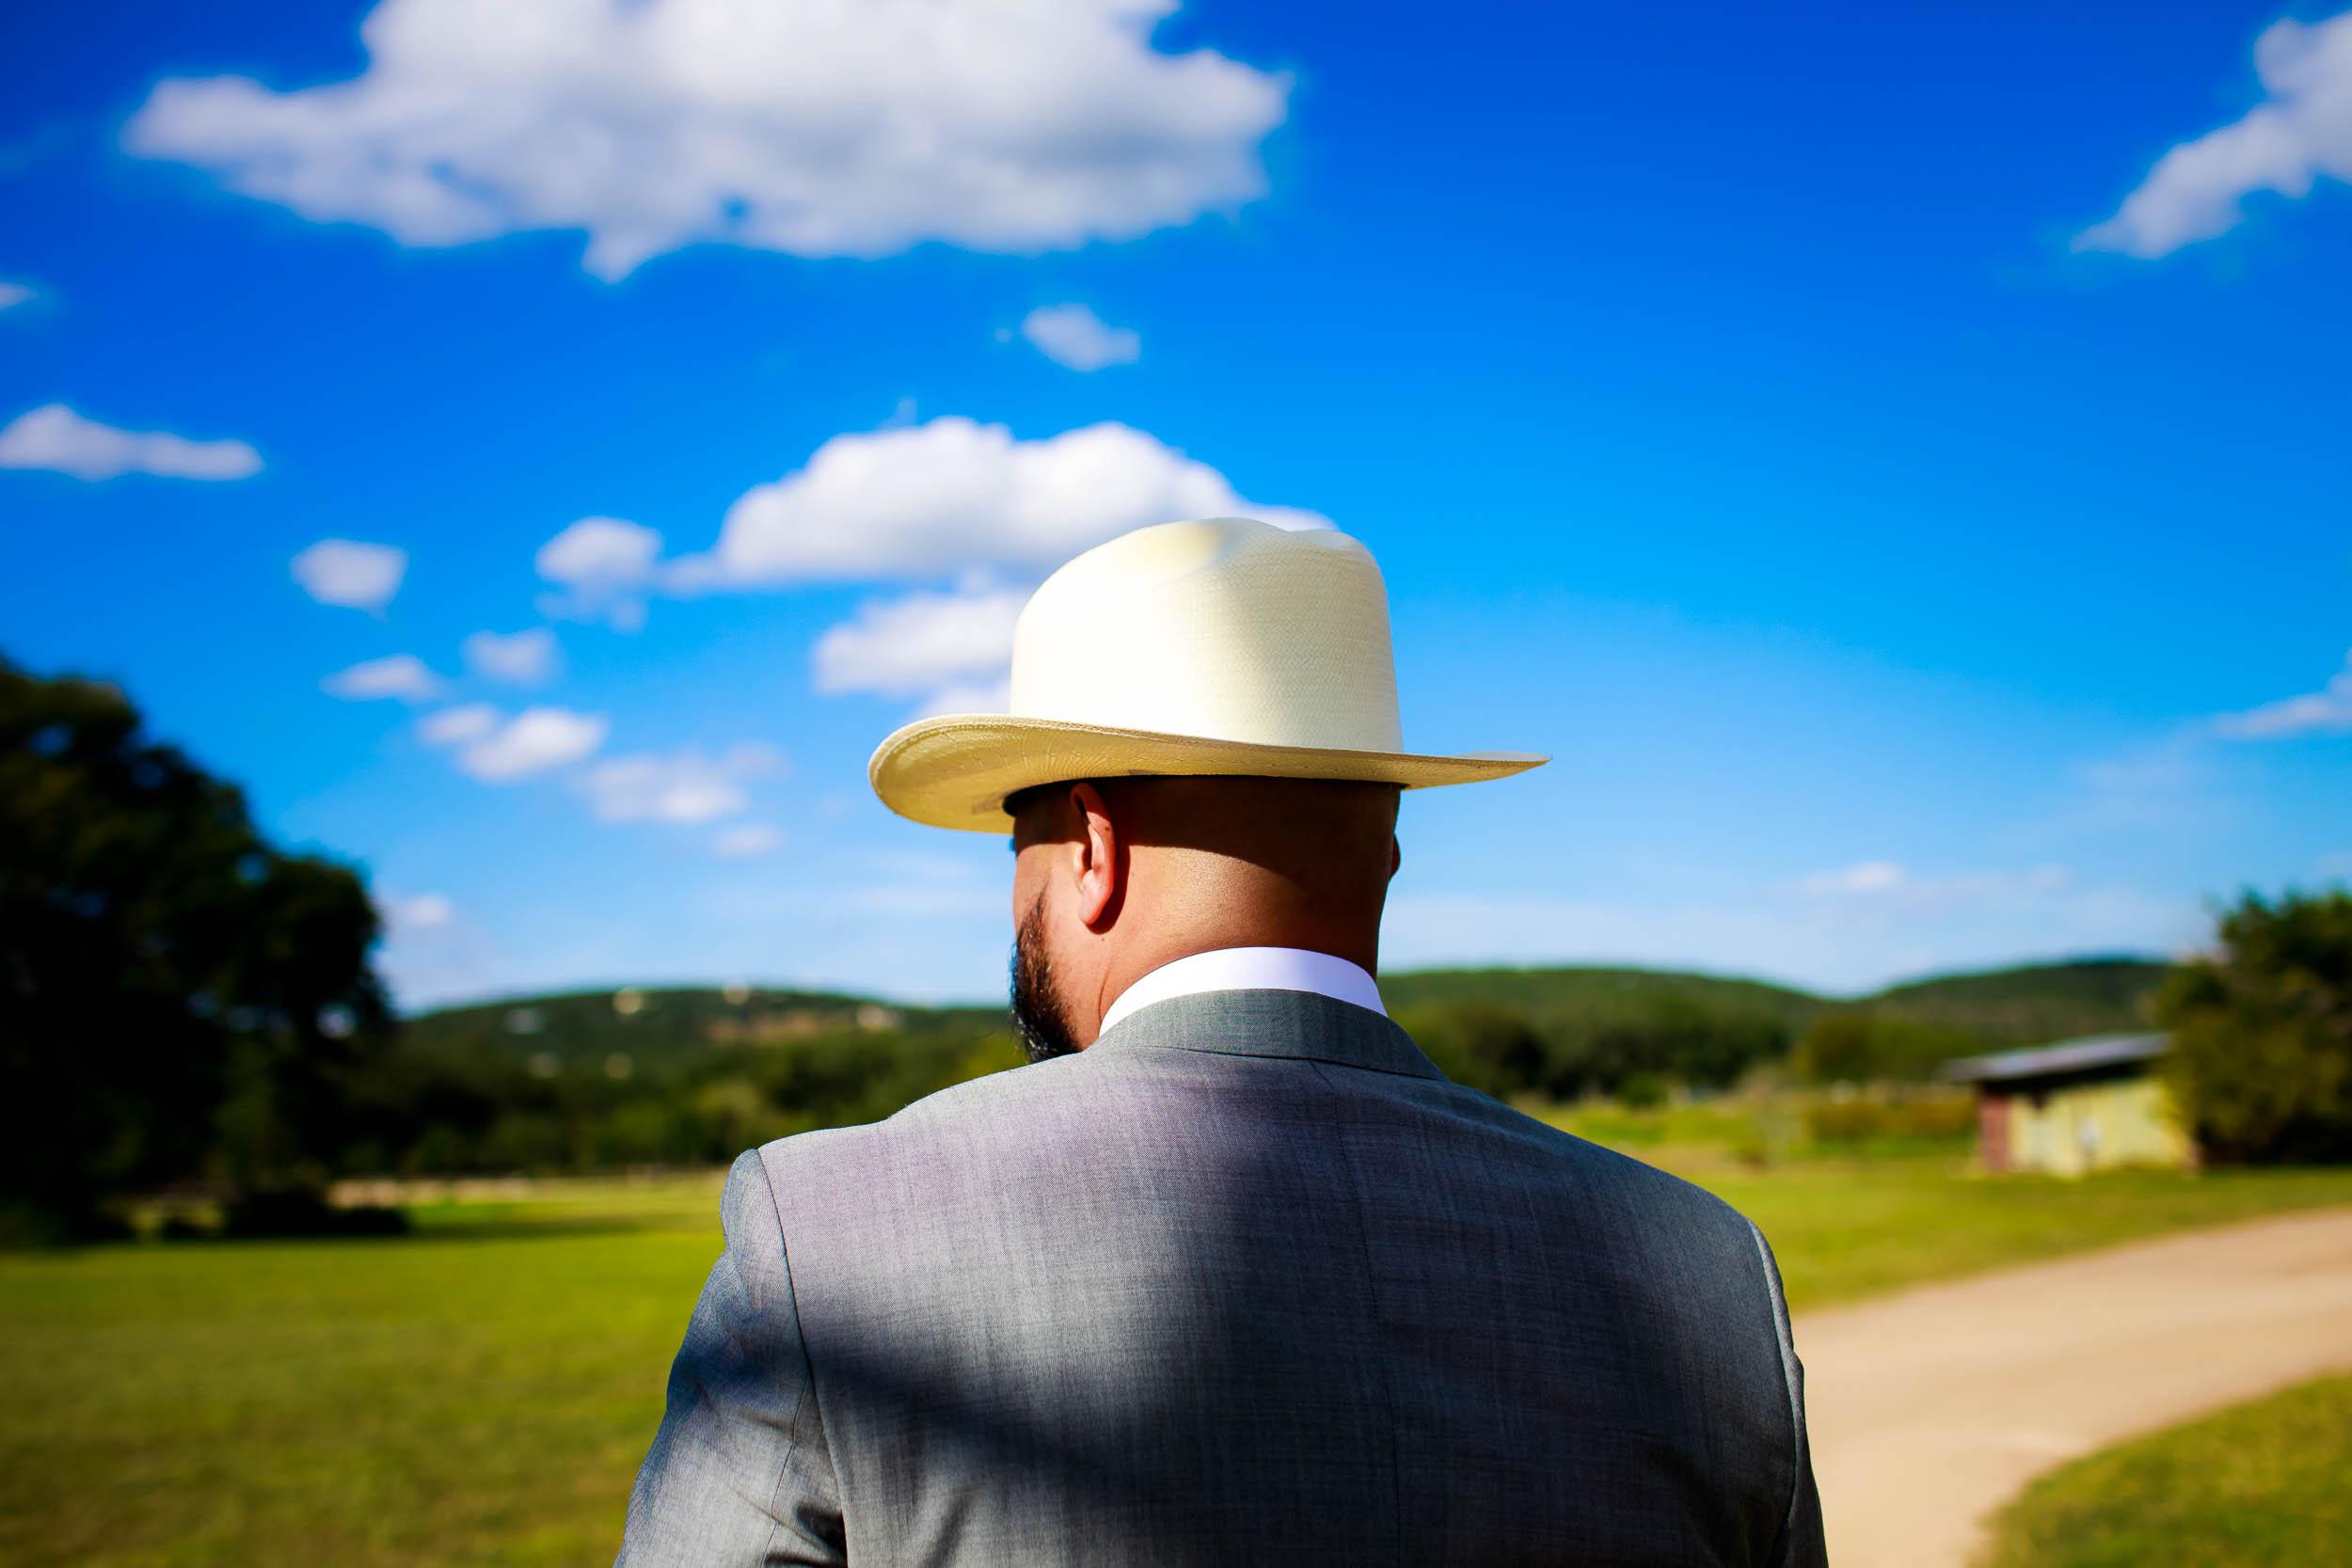 Groom at a Montesino Ranch wedding Austin, Texas.